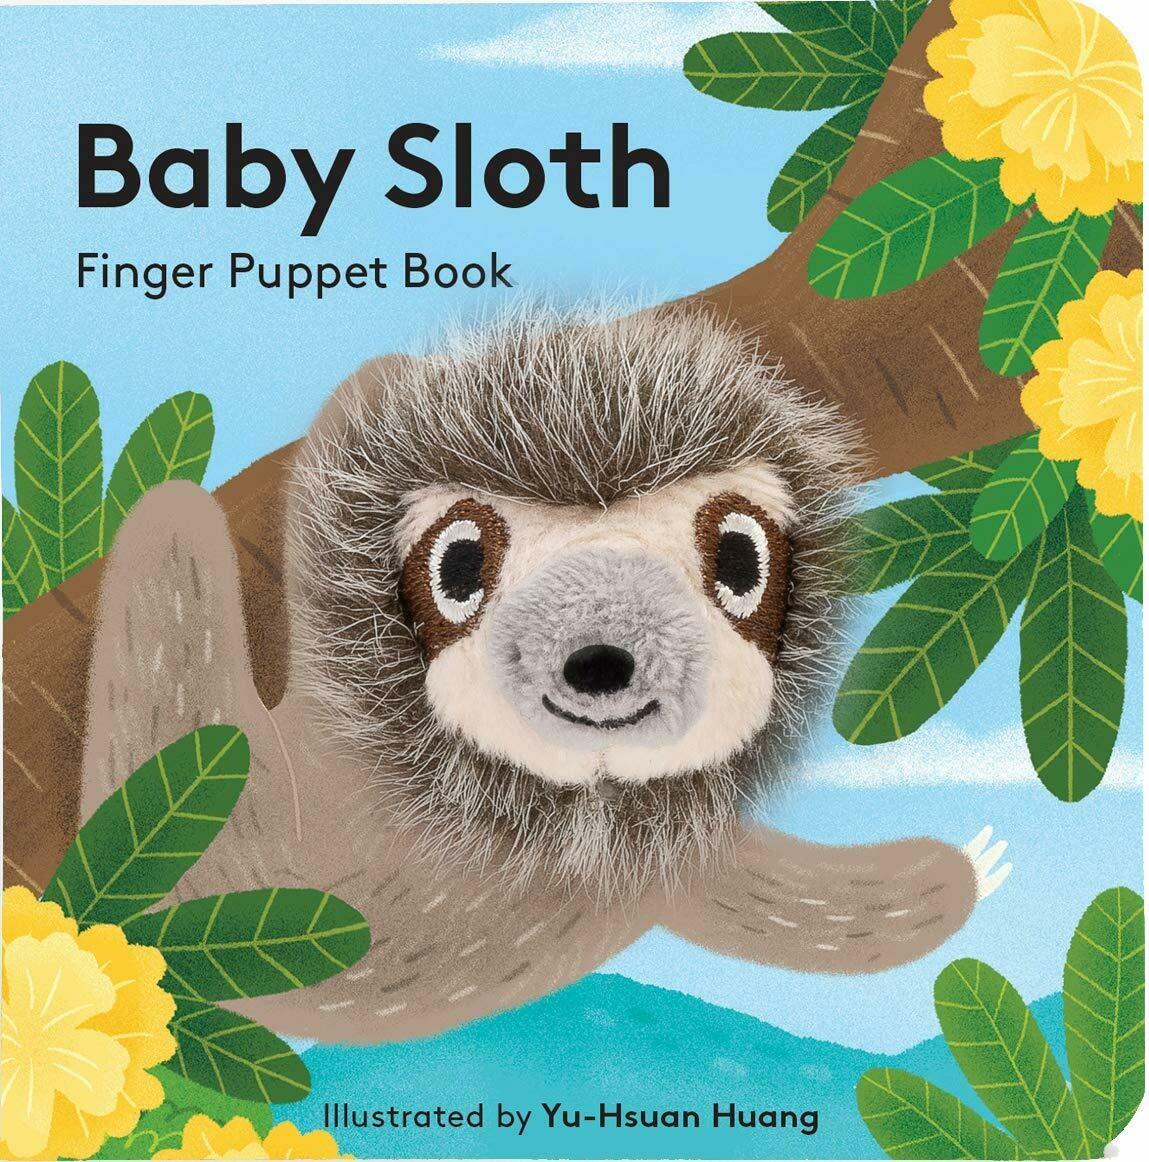 Baby Sloth Book